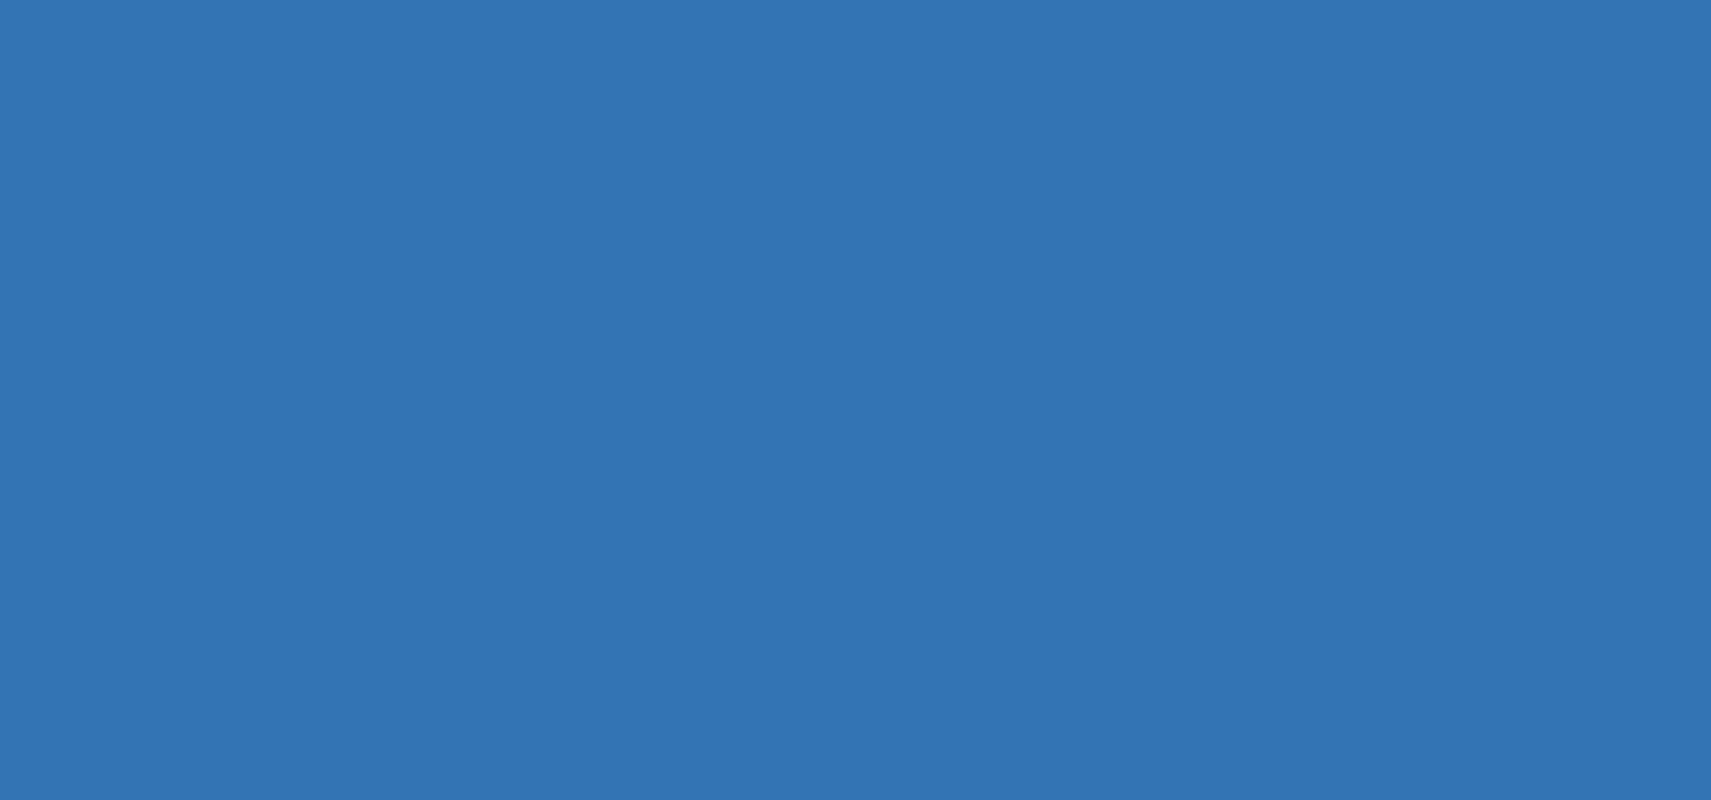 Aduis Acryliic acrylverf - 500 ml, primair blauw